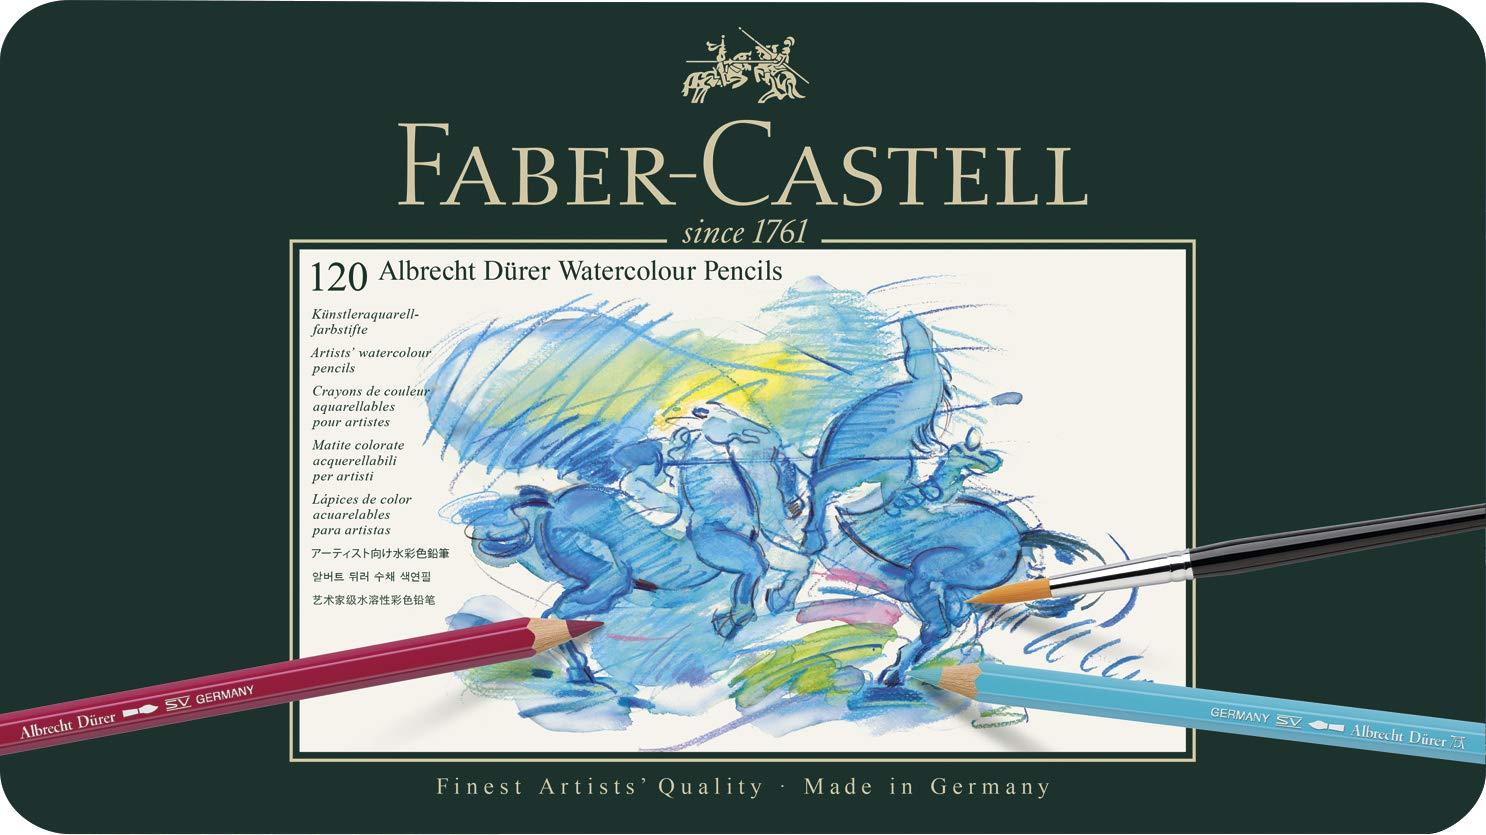 Faber-Castell 117511 – Estuche de metal con 120 ecolápices acuarelables, multicolor